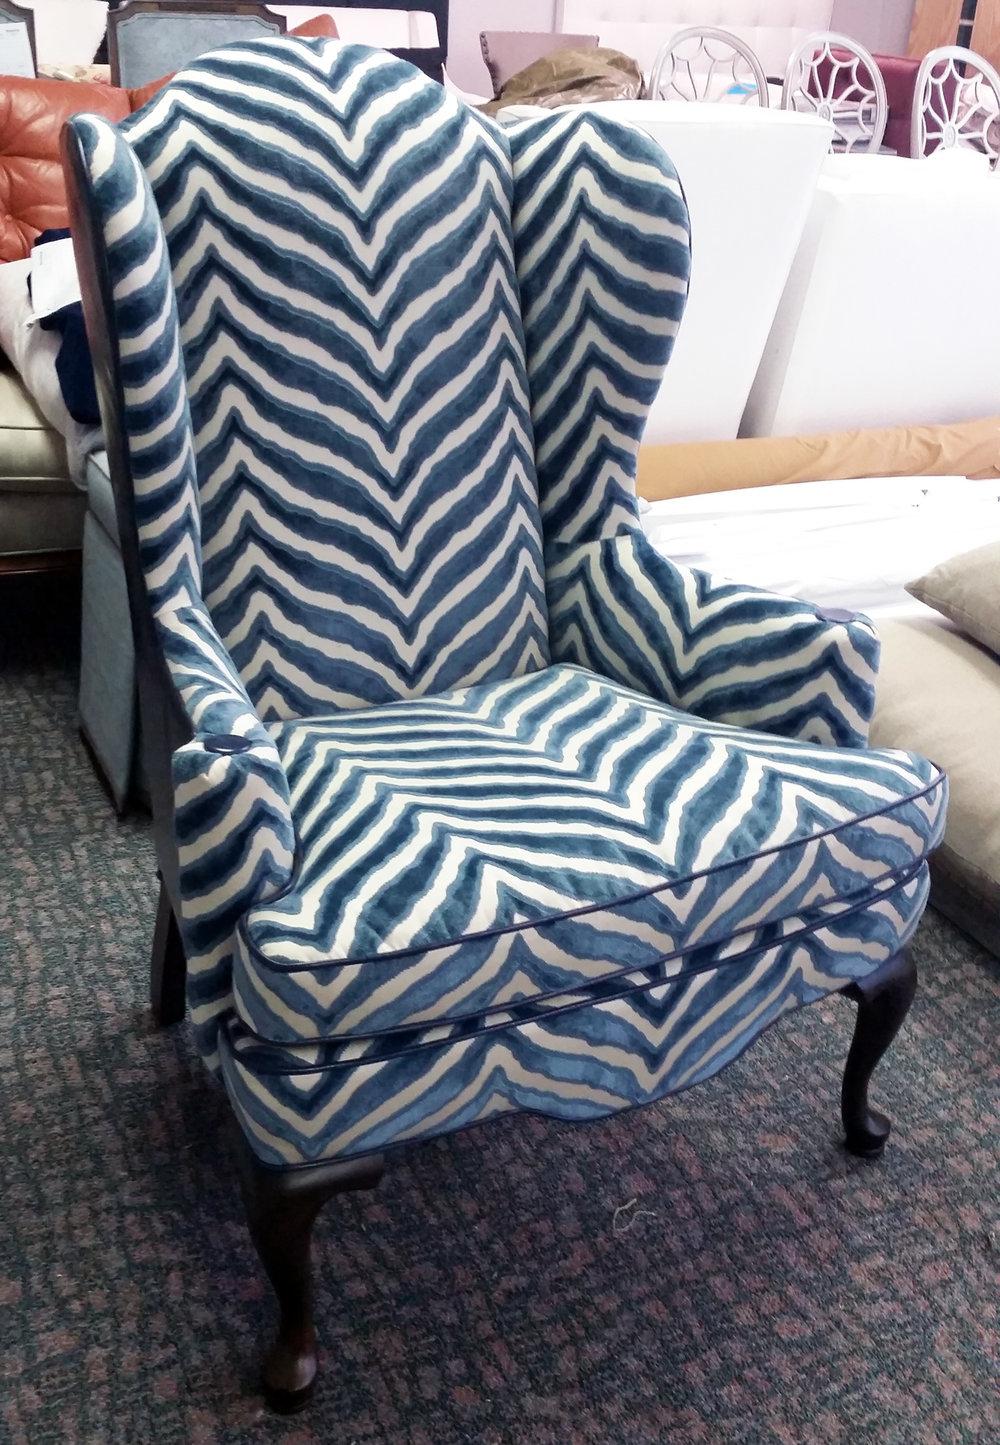 centuryupholstery_chair4.jpg